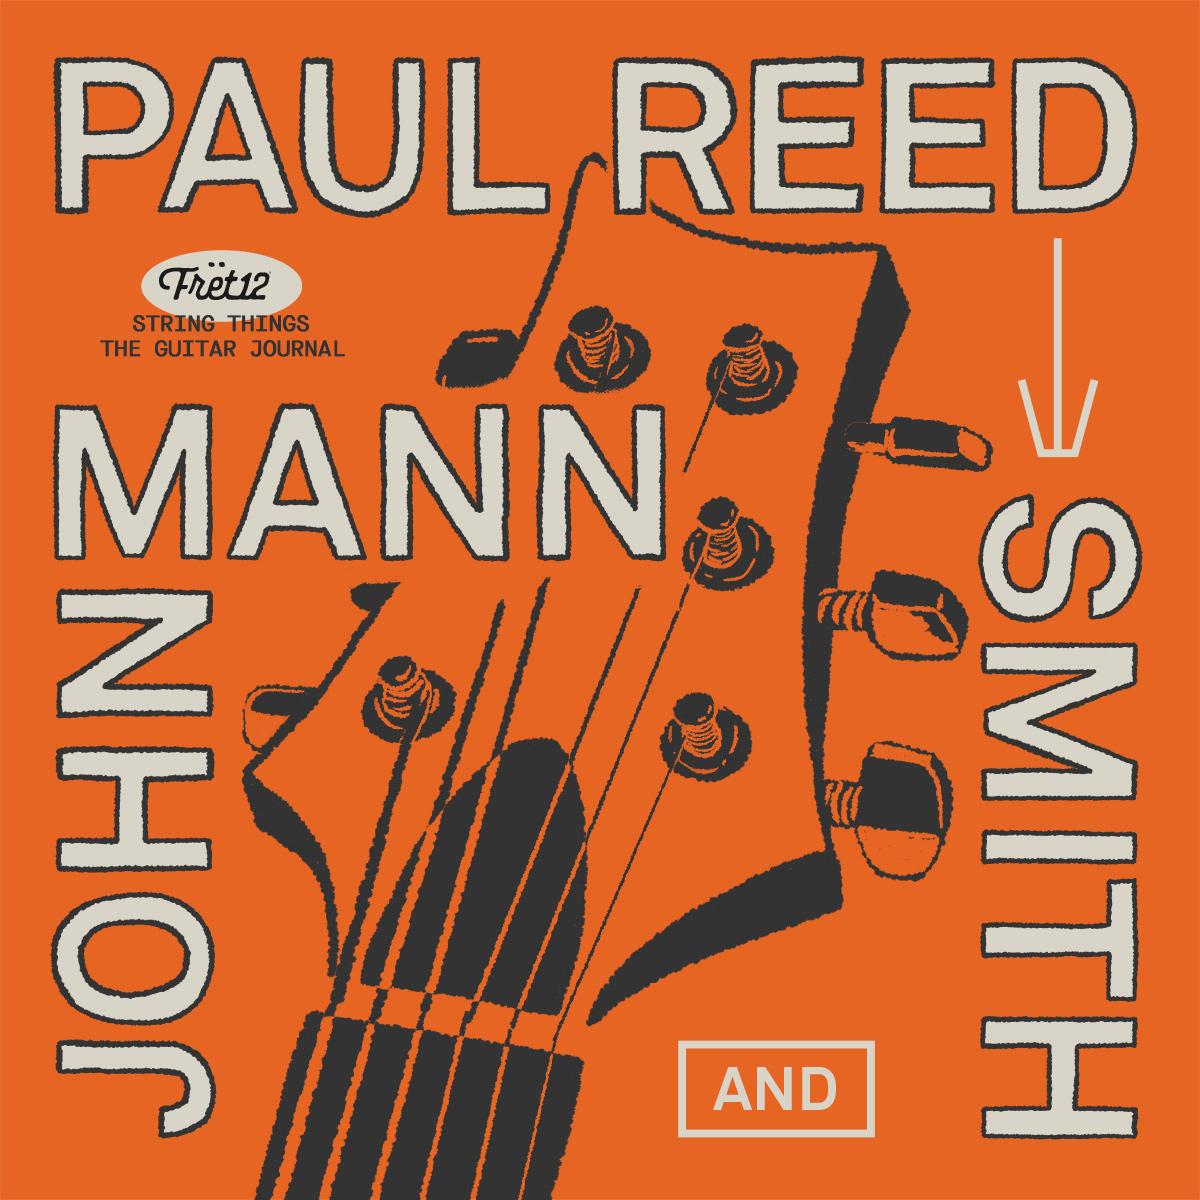 Paul Reed Smith and John Mann